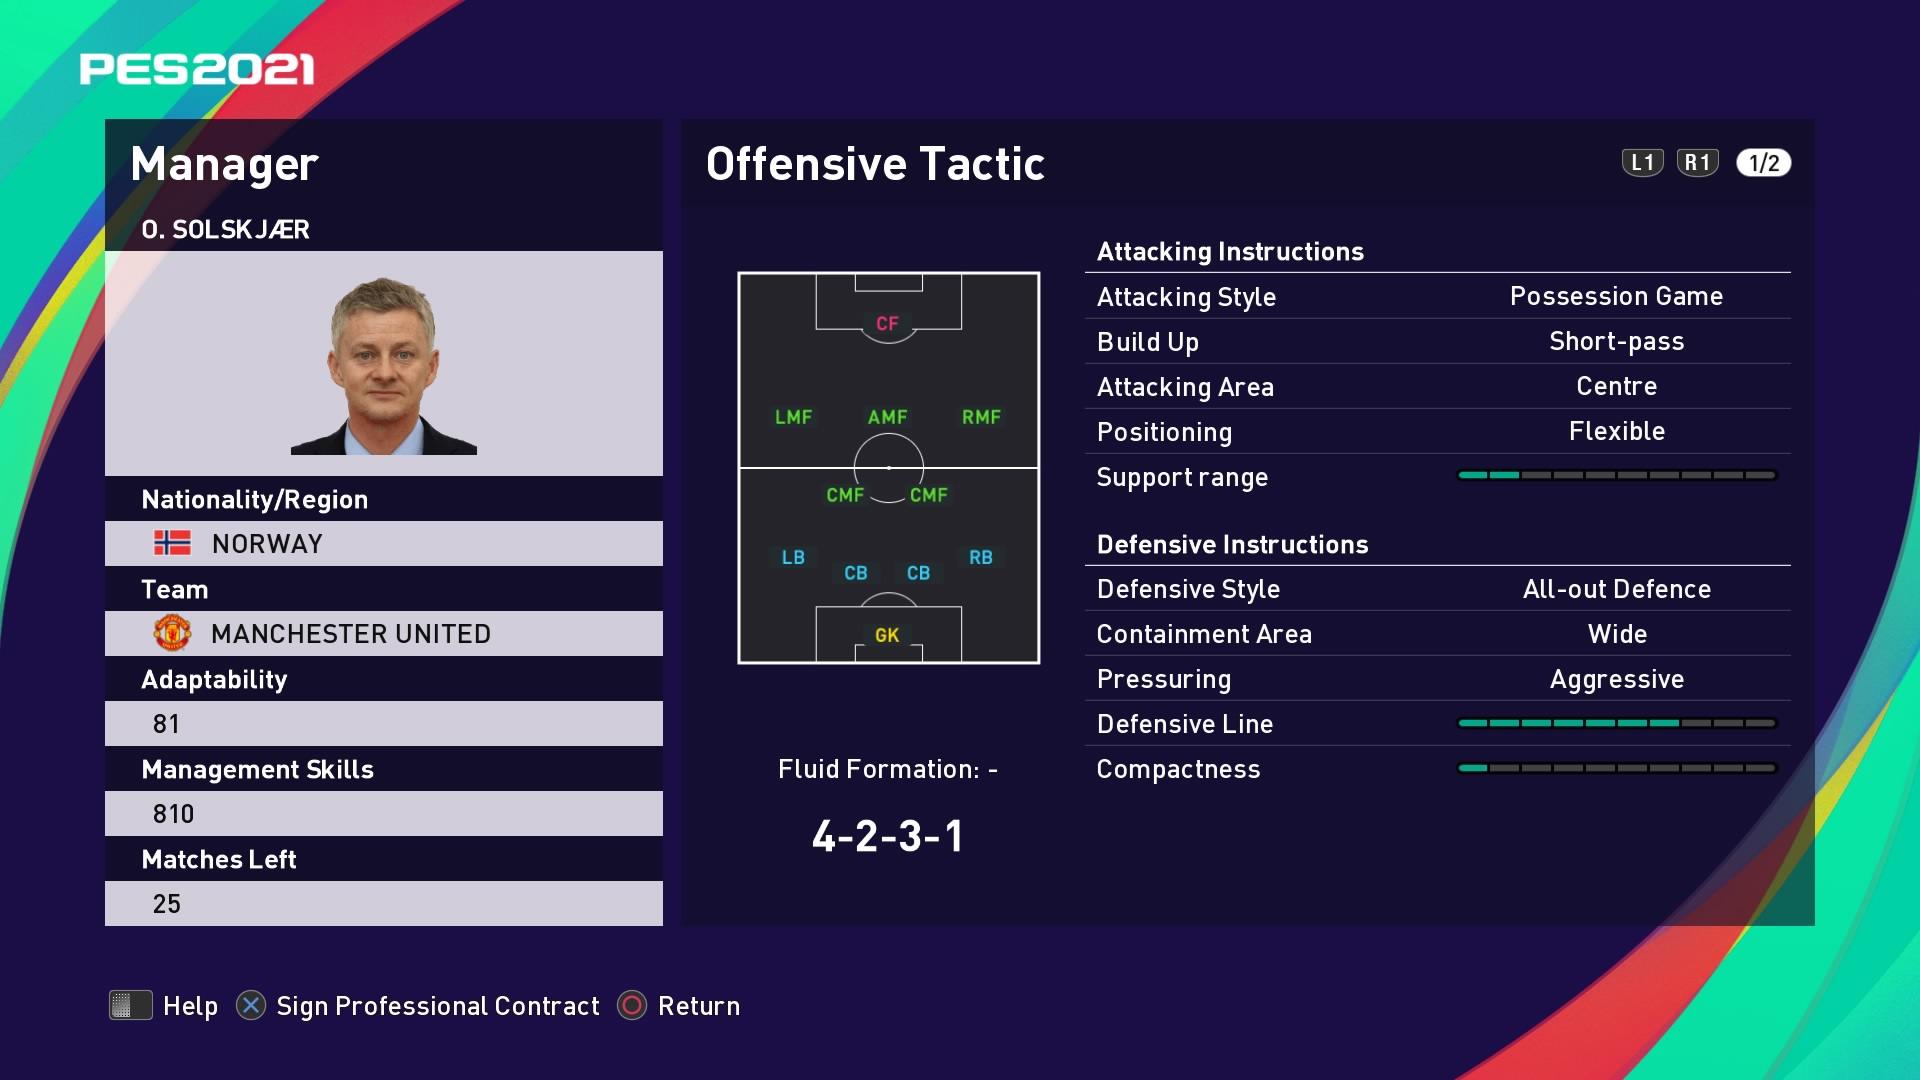 O. Solskjaer (2) (Ole Gunnar Solskjær) Offensive Tactic in PES 2021 myClub